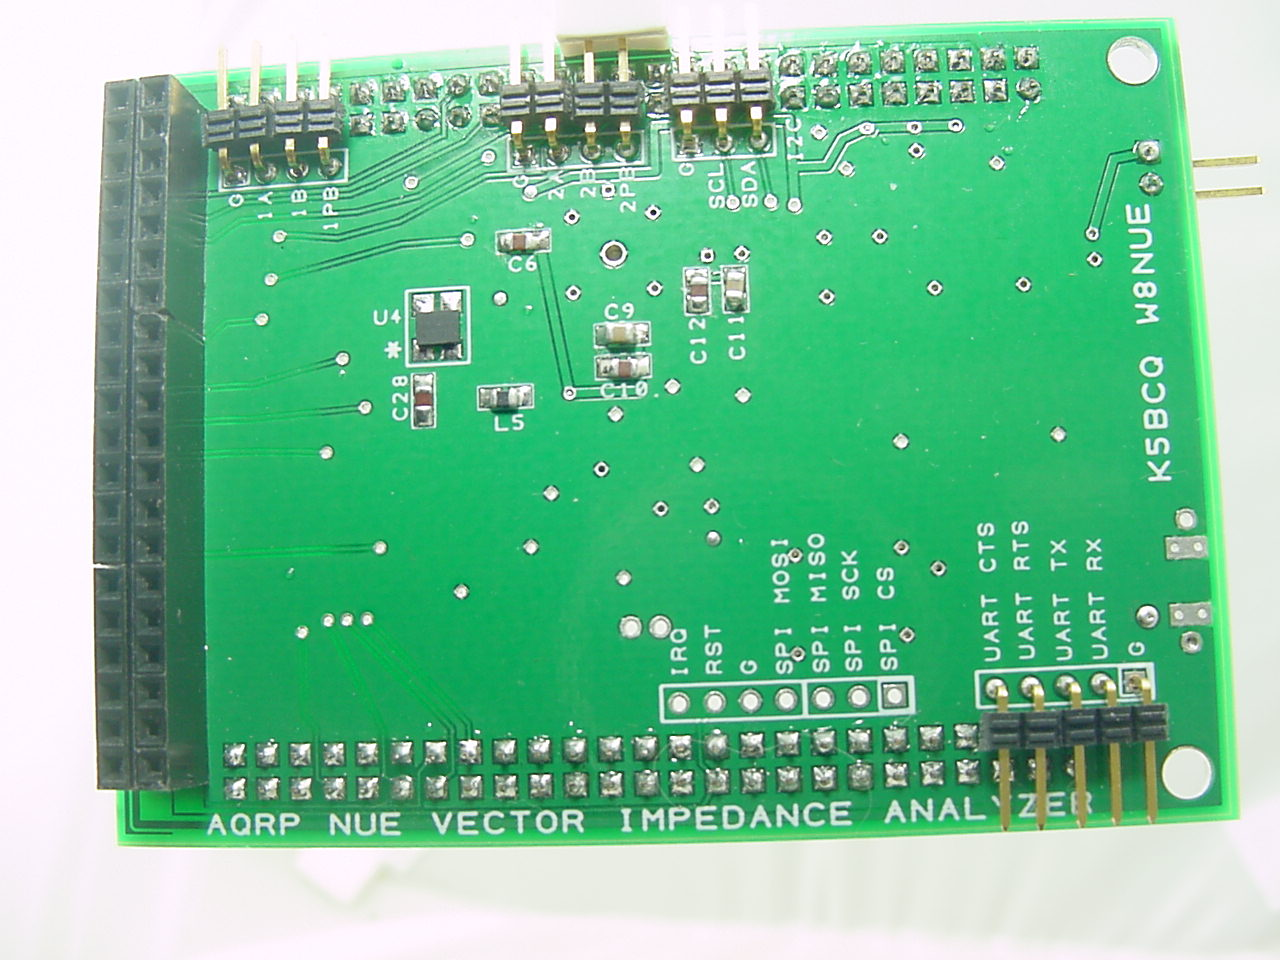 K5bcq K5jhf Kits Circuit Board Mounting Bracket For Din Rail Ebay Aqrp Via Higher Resolution Of Bottom